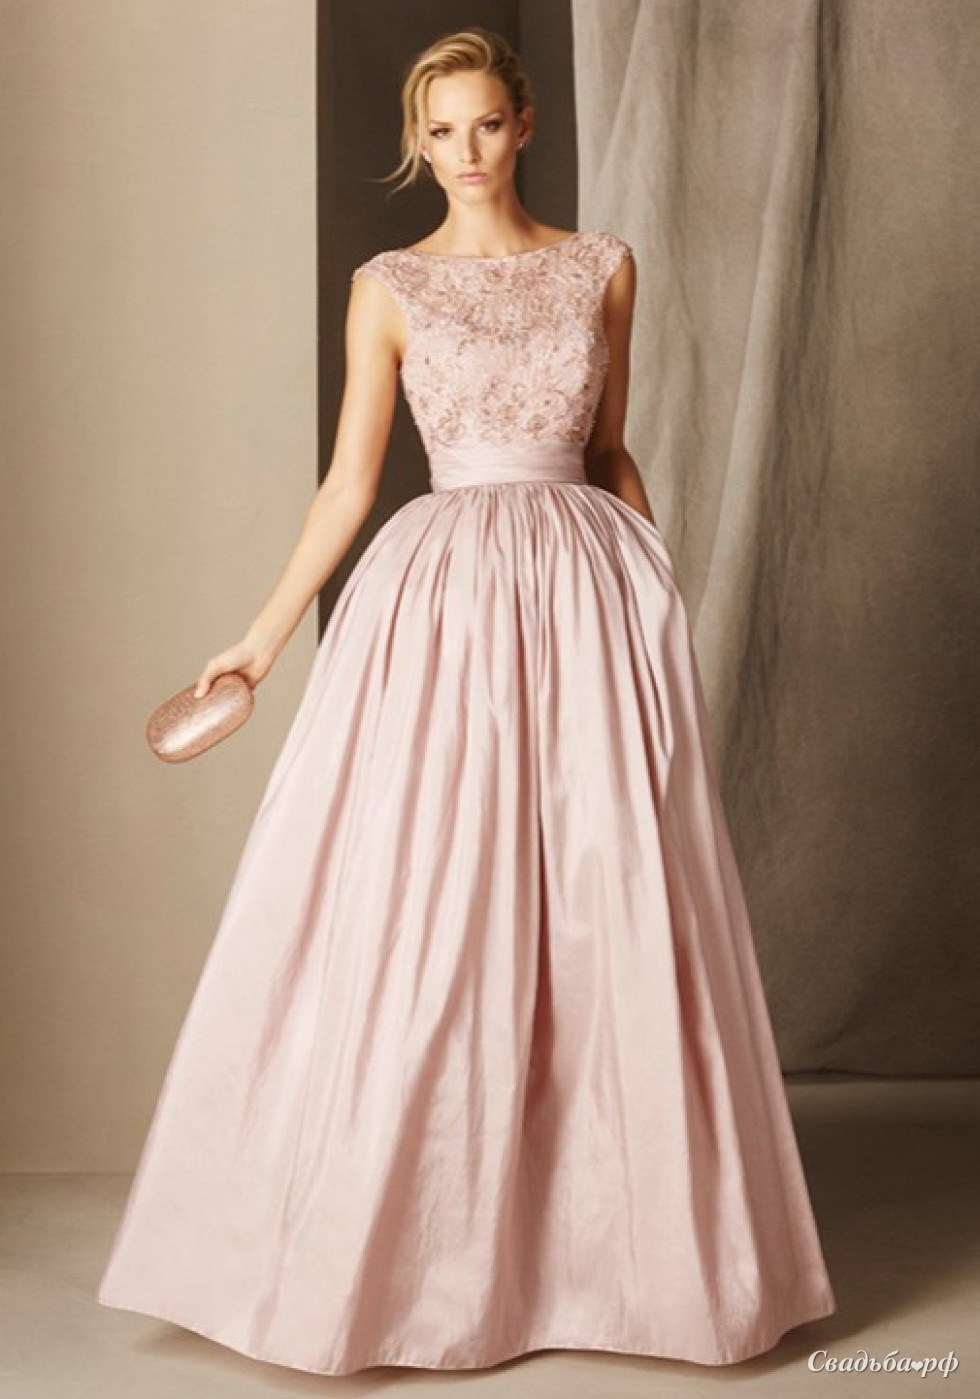 Вечерние платья 2017 новинки на свадьбу